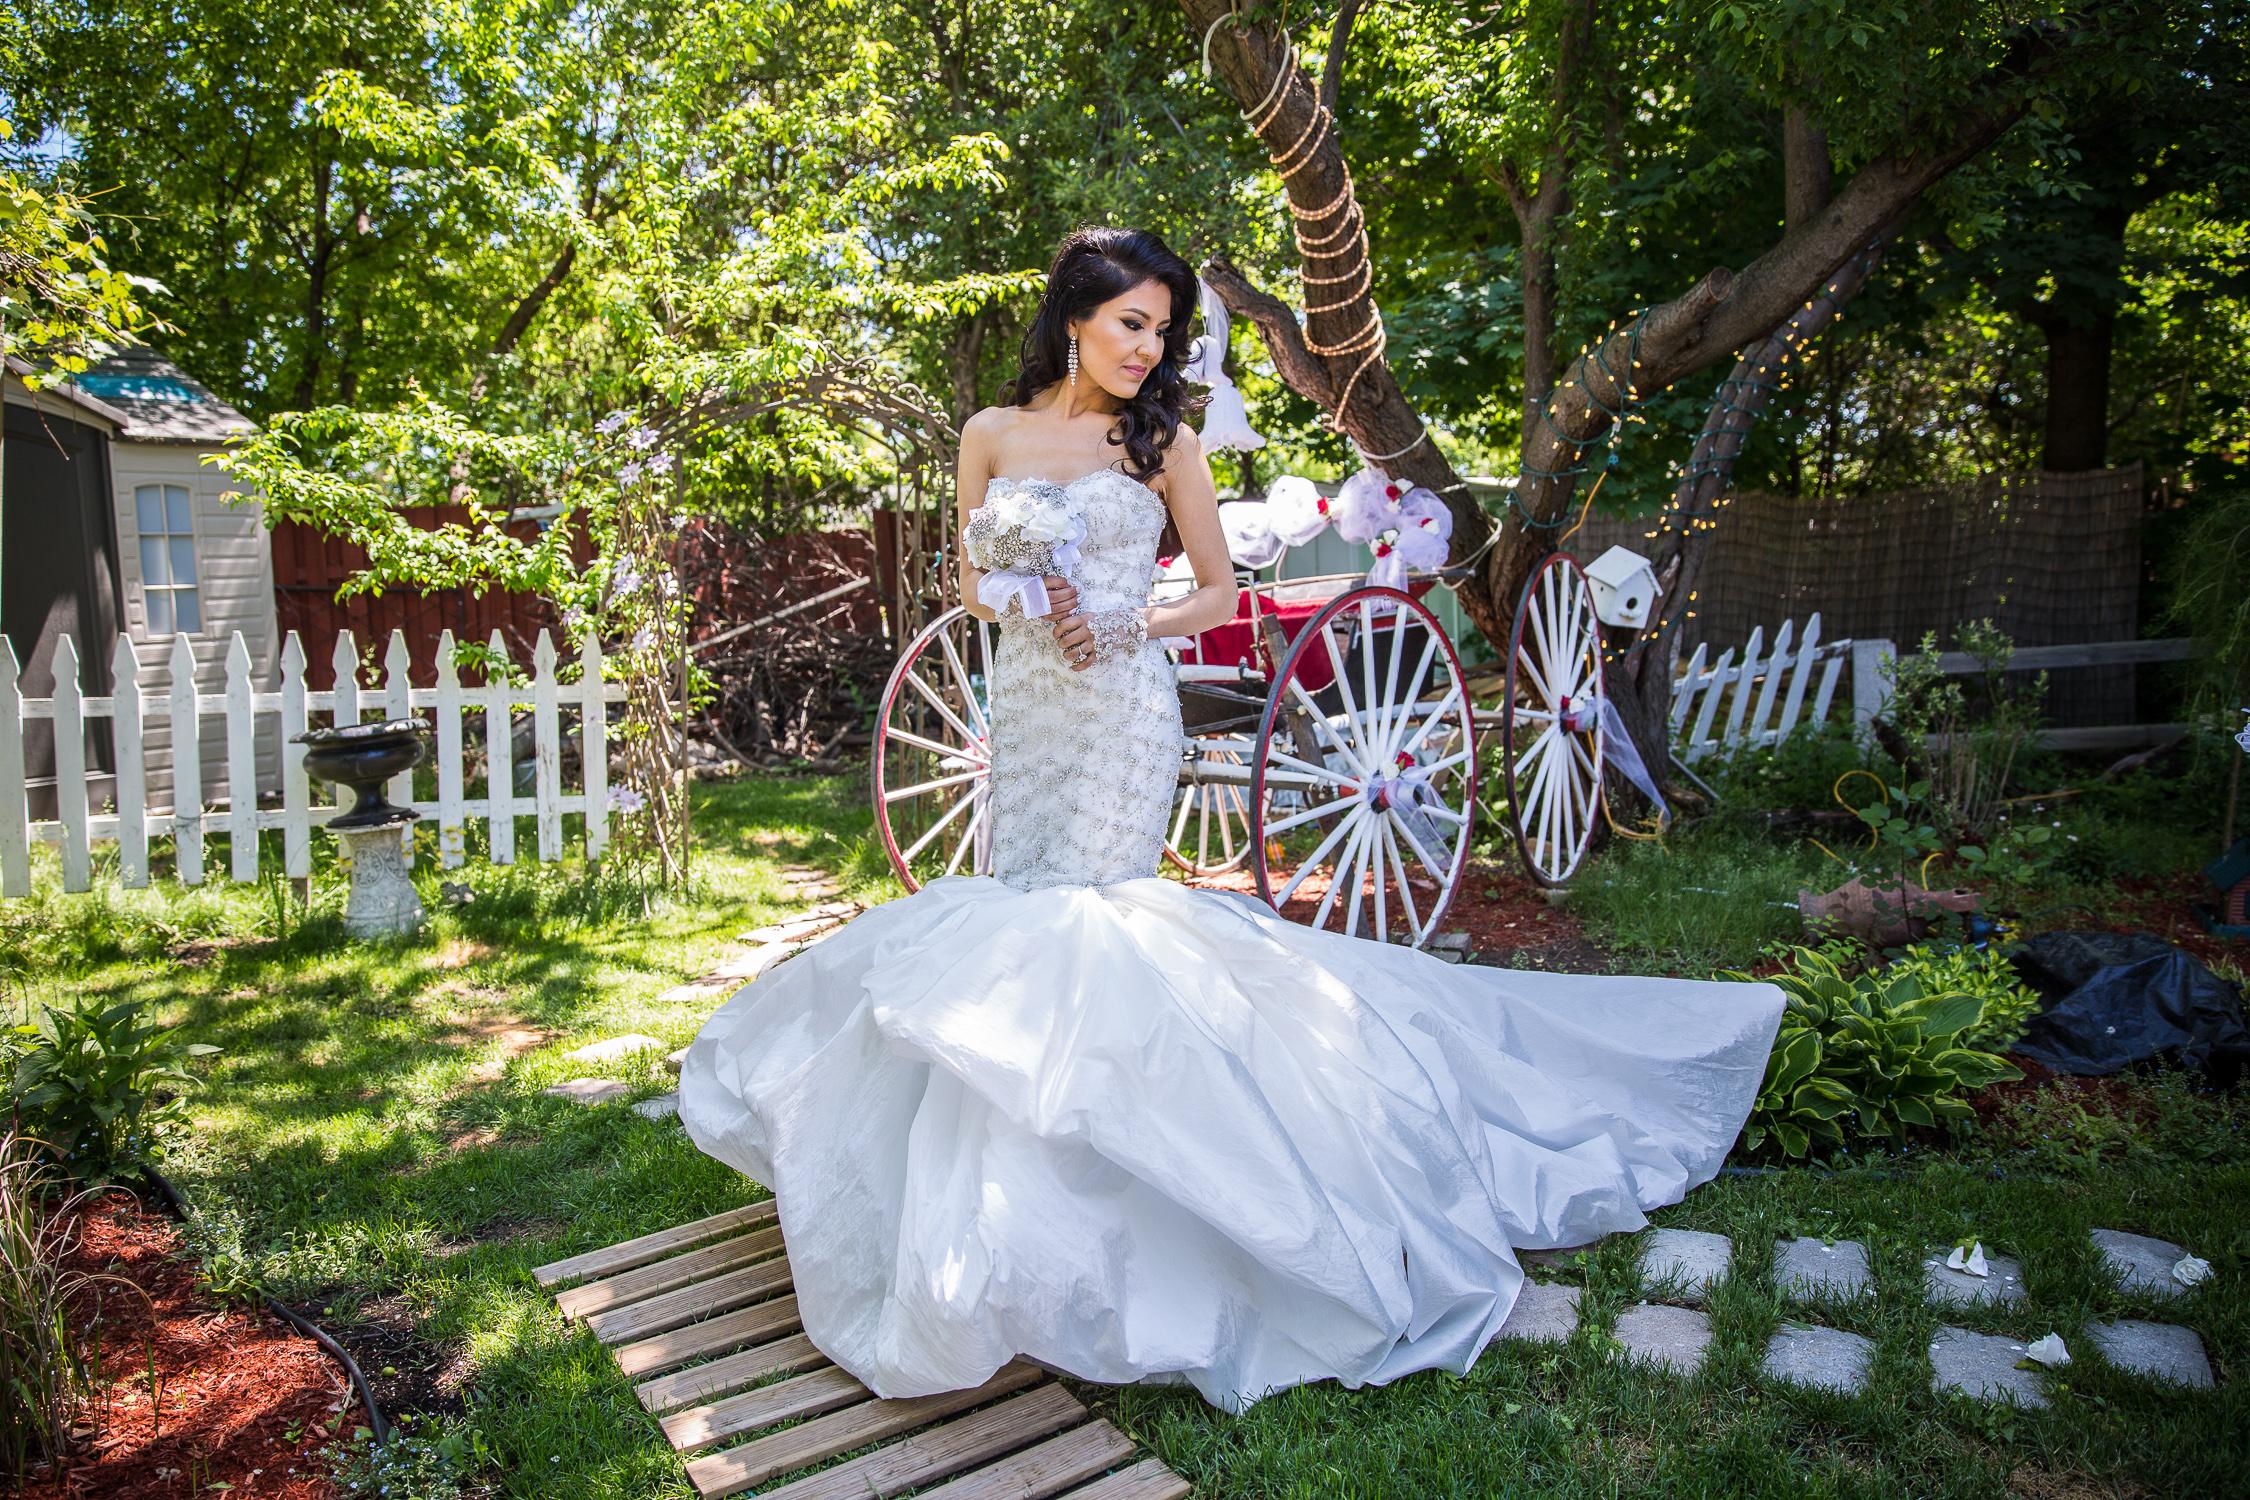 Paradise-Banquet-Hall-Wedding-Vaughan-Ontario-0024.jpg